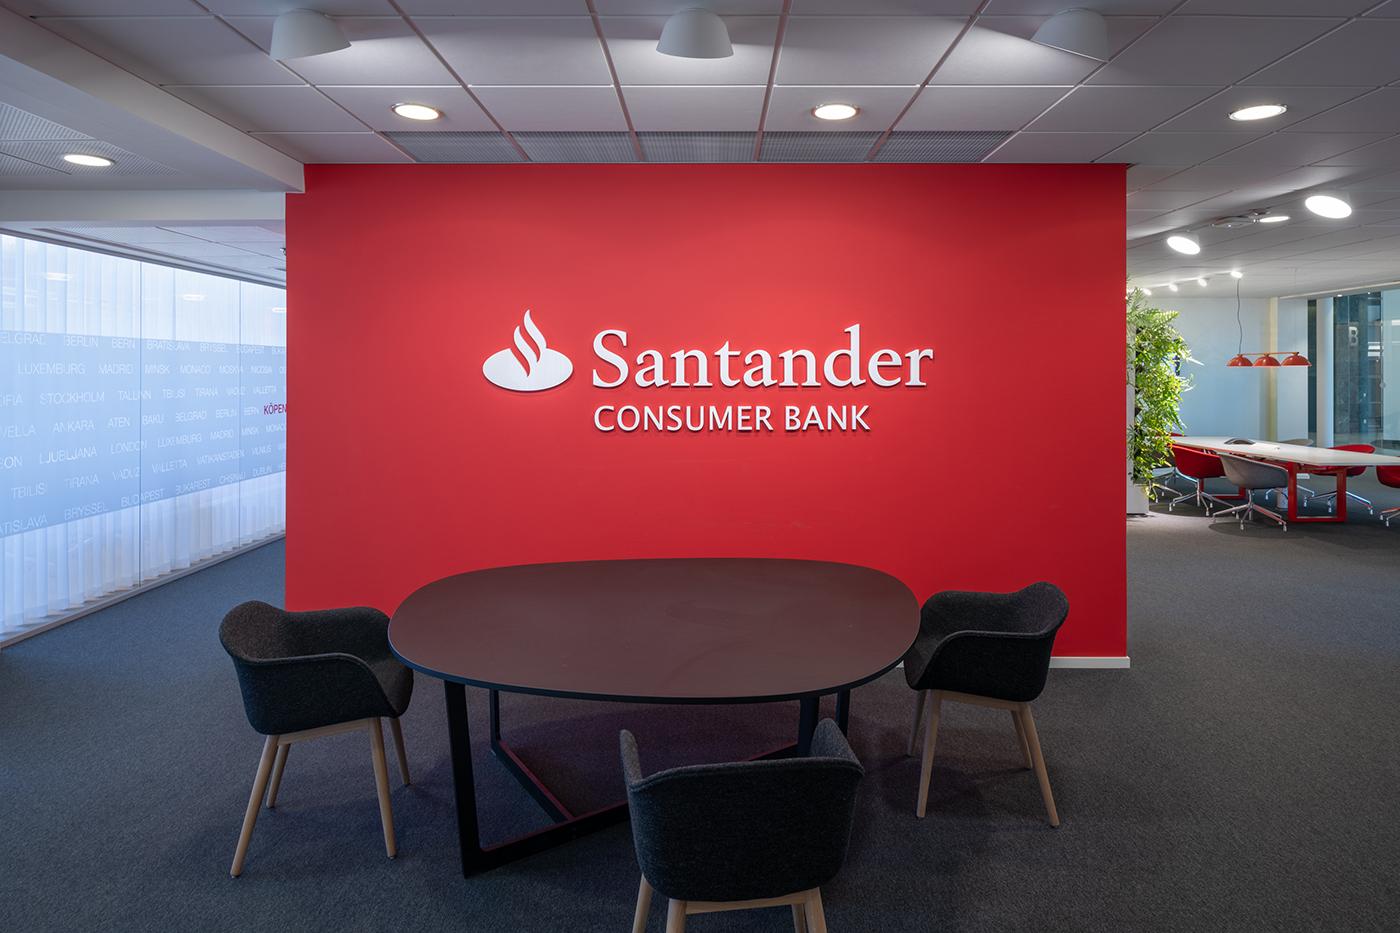 Thirty-Santander1.JPG